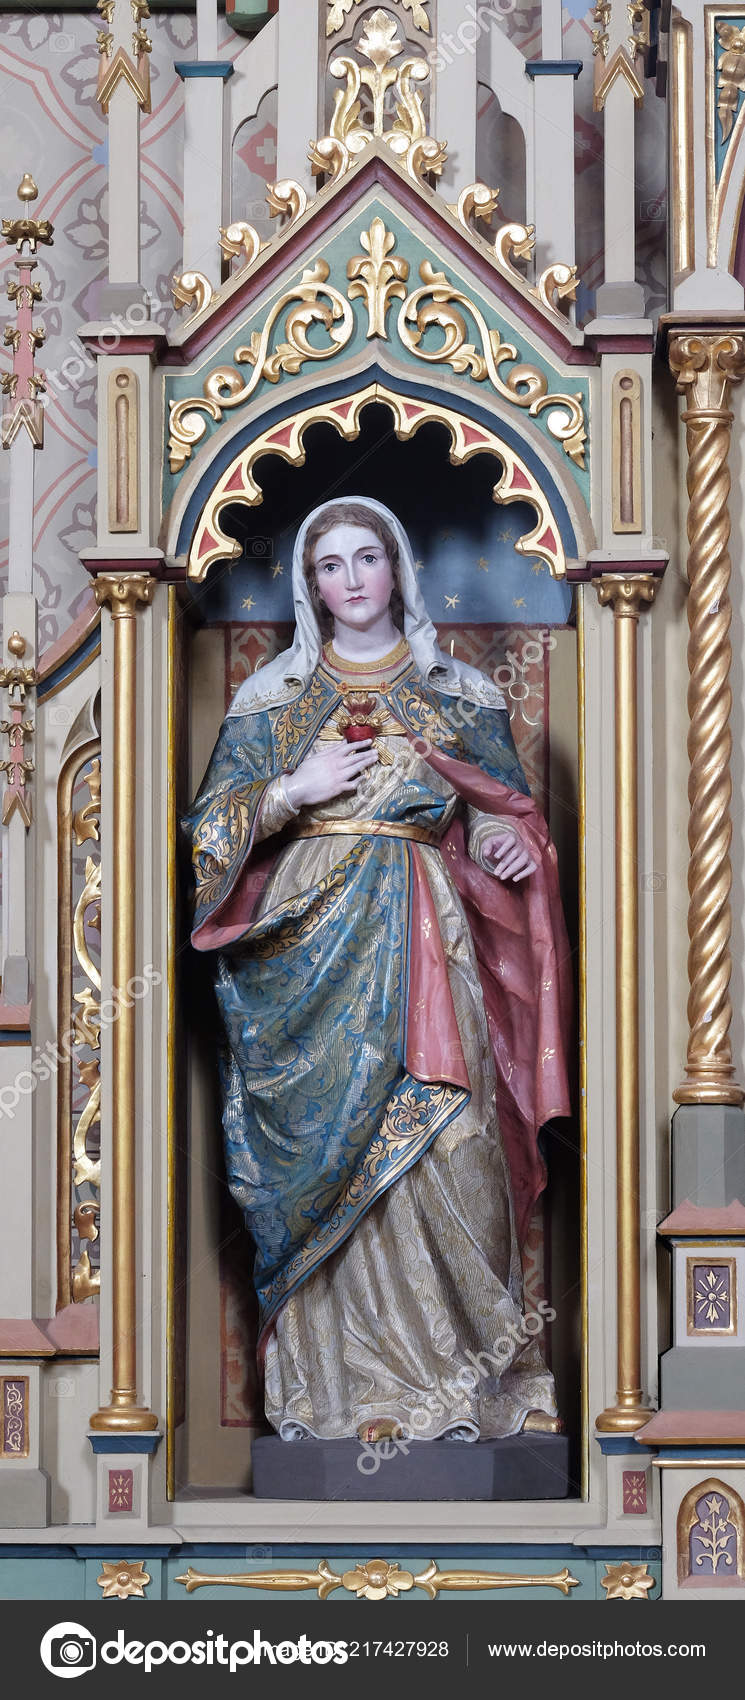 depositphotos 217427928 stock photo immaculate heart mary statue sacred